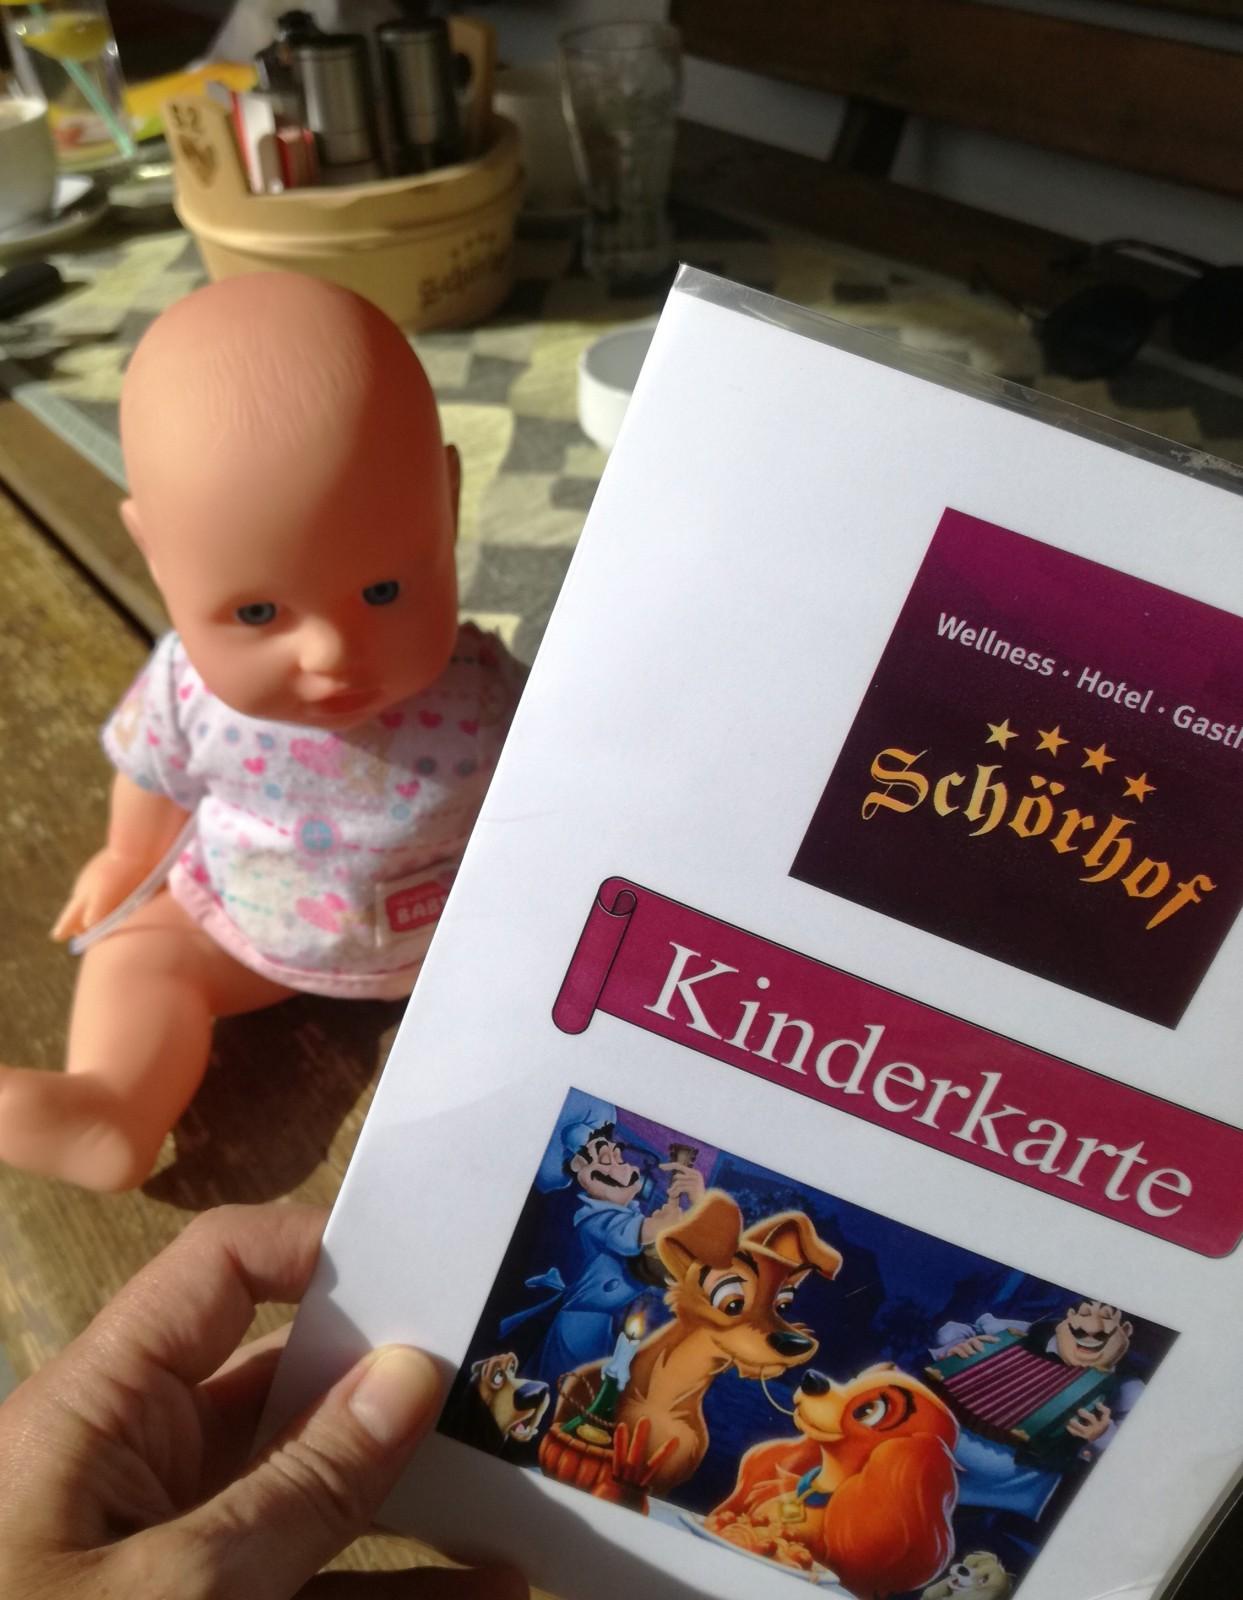 Kinderkarte im Schörhof